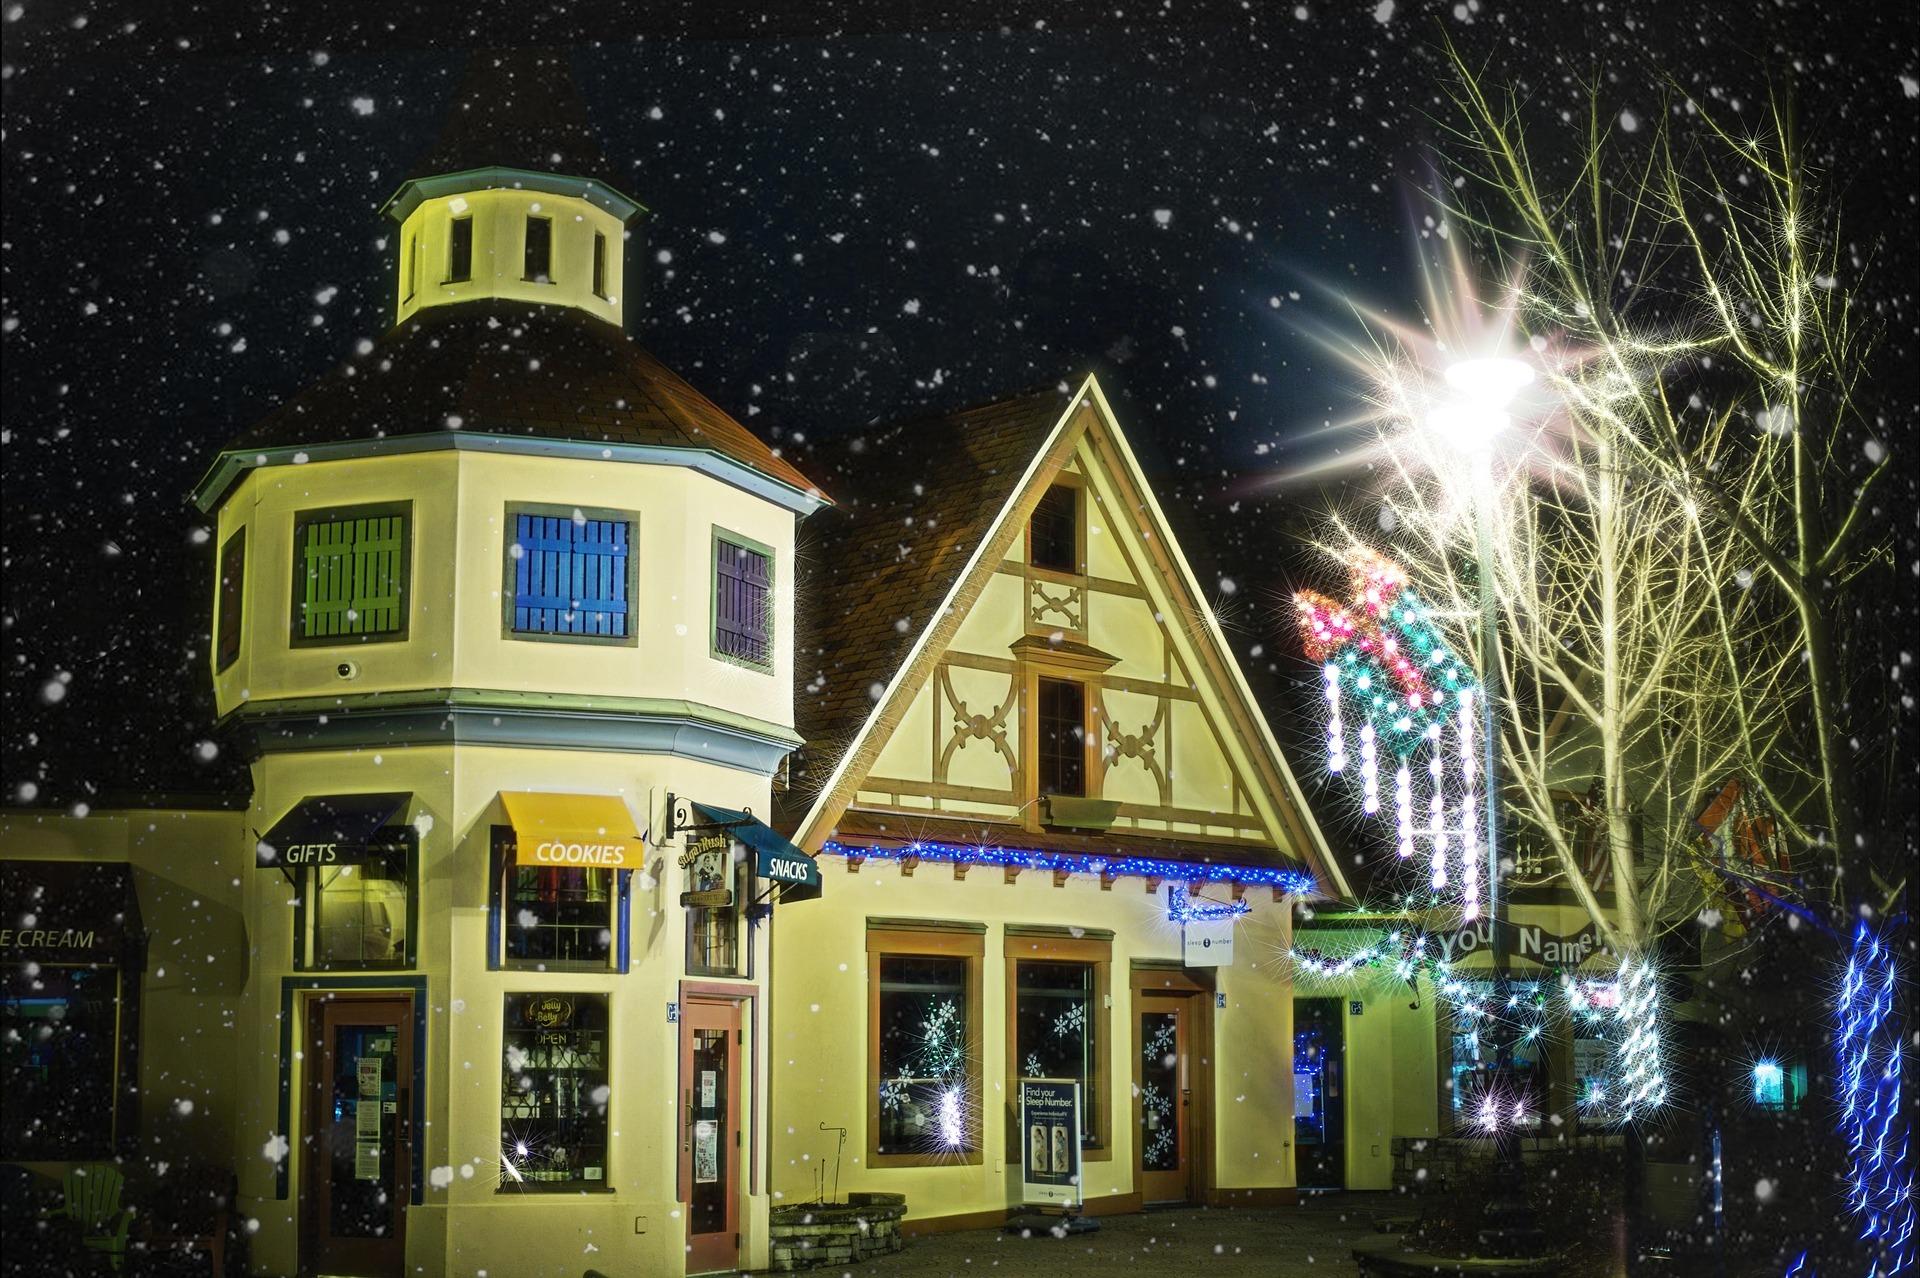 Christmas village photo